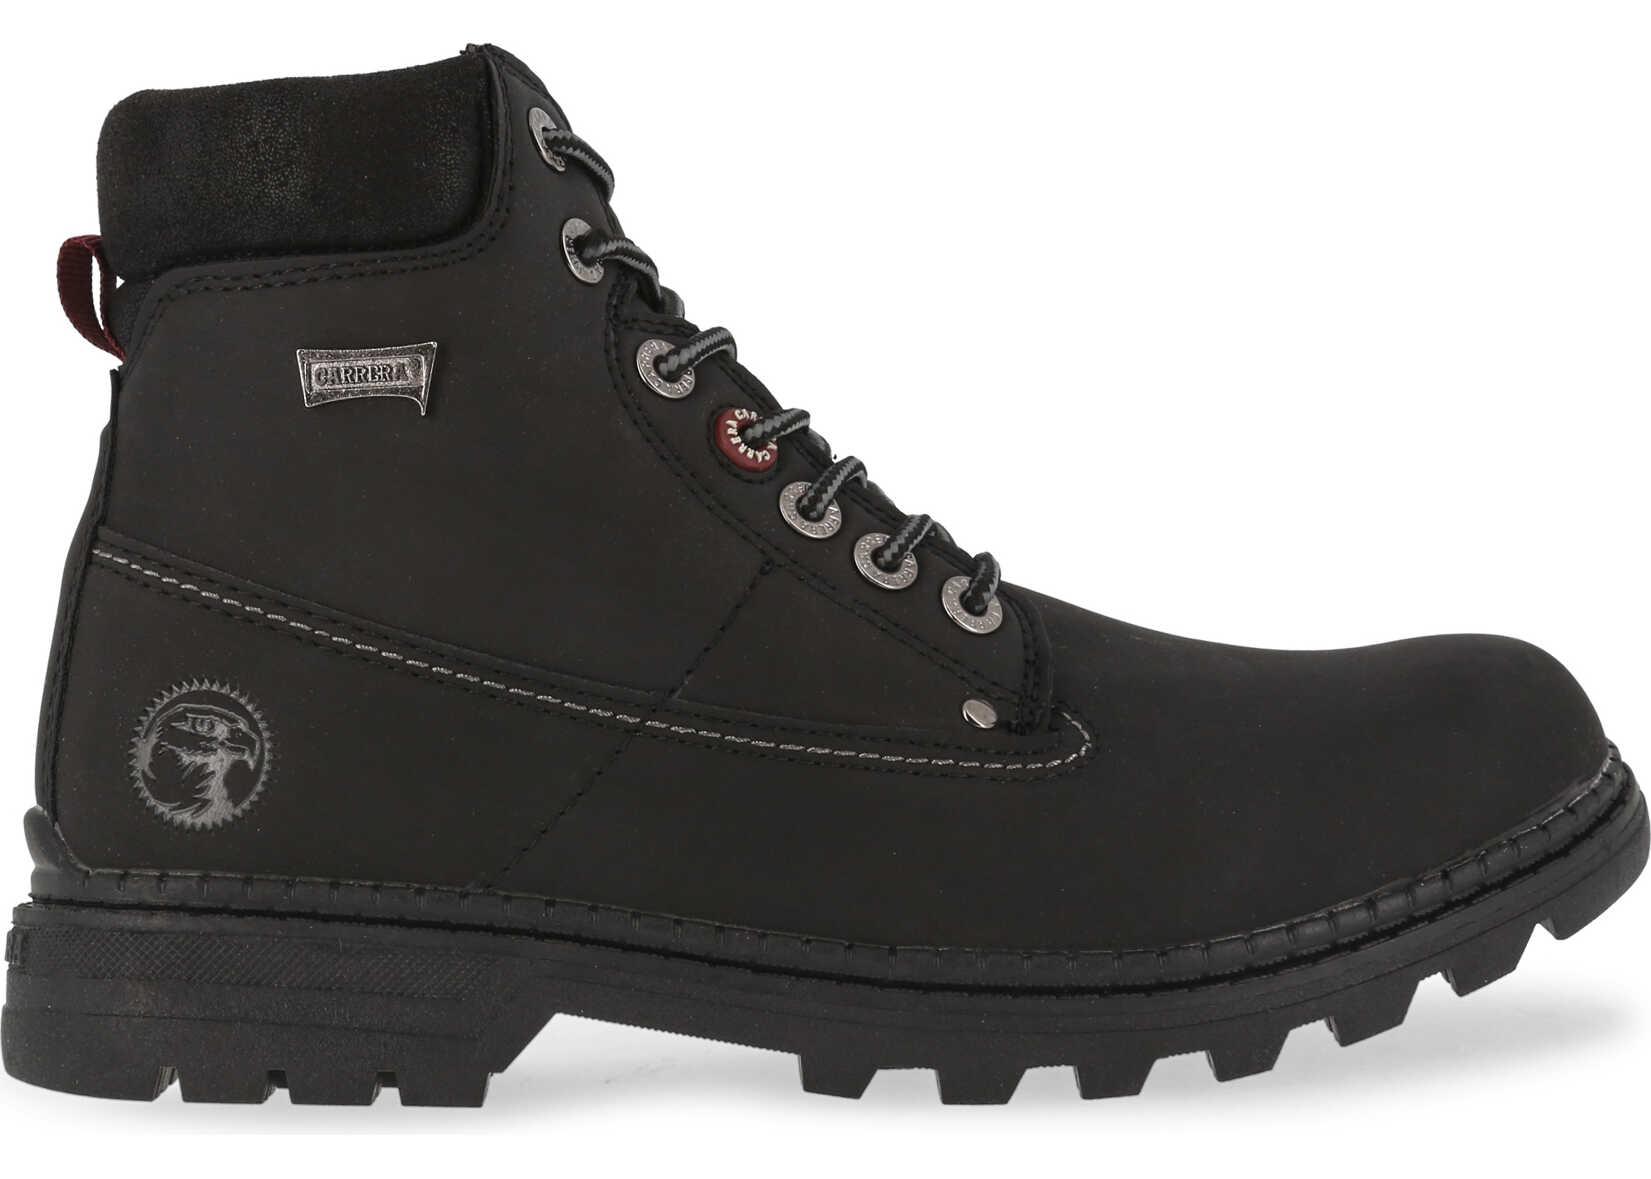 Carrera Jeans Nevada_Cam721050 Black